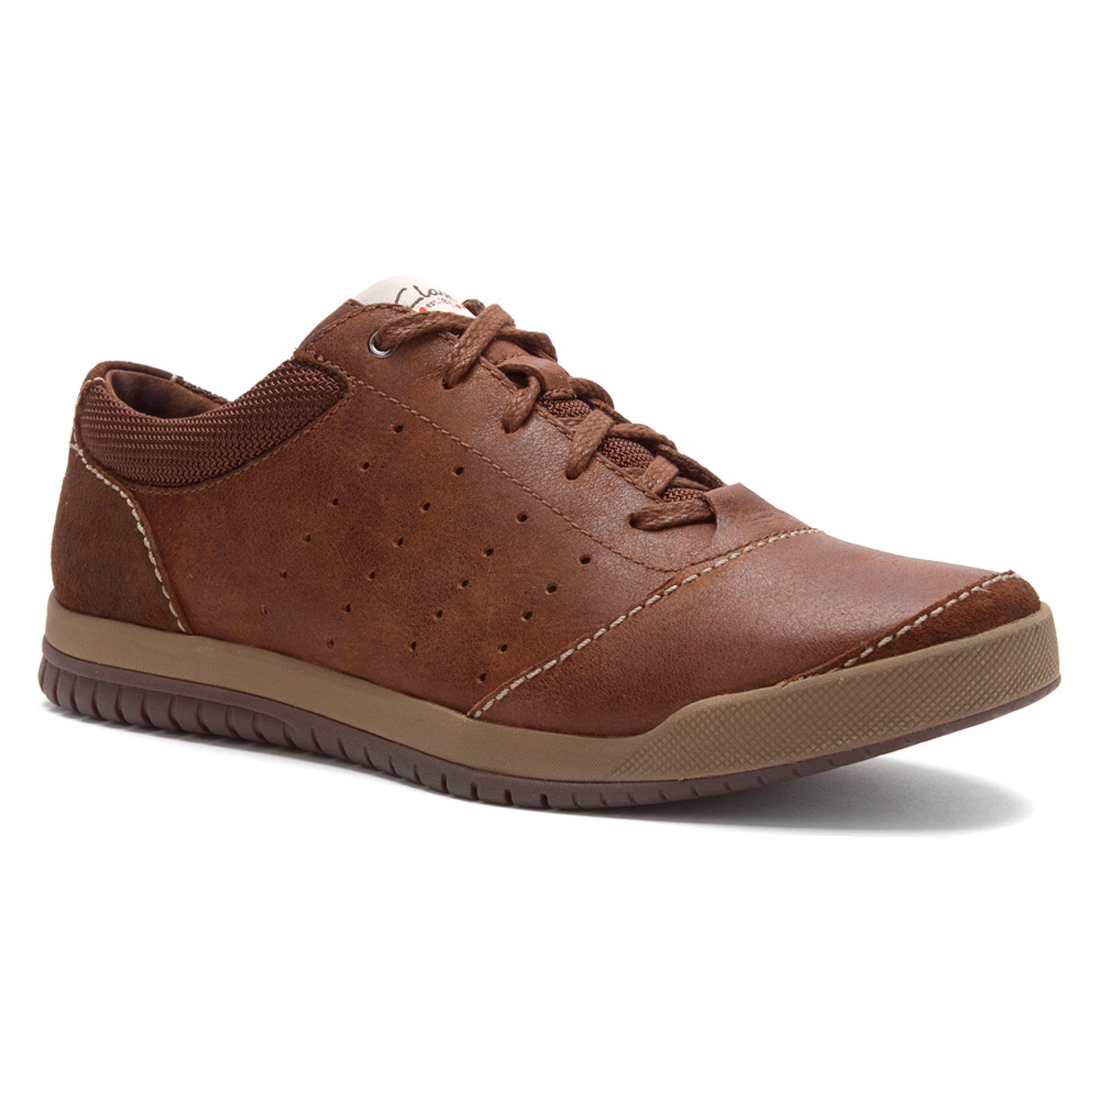 Clarks Men's Rhombus Euro Casual Oxfords - Tan Suede | Discount Clarks Men's  Casual Shoes & More - Shoolu.com